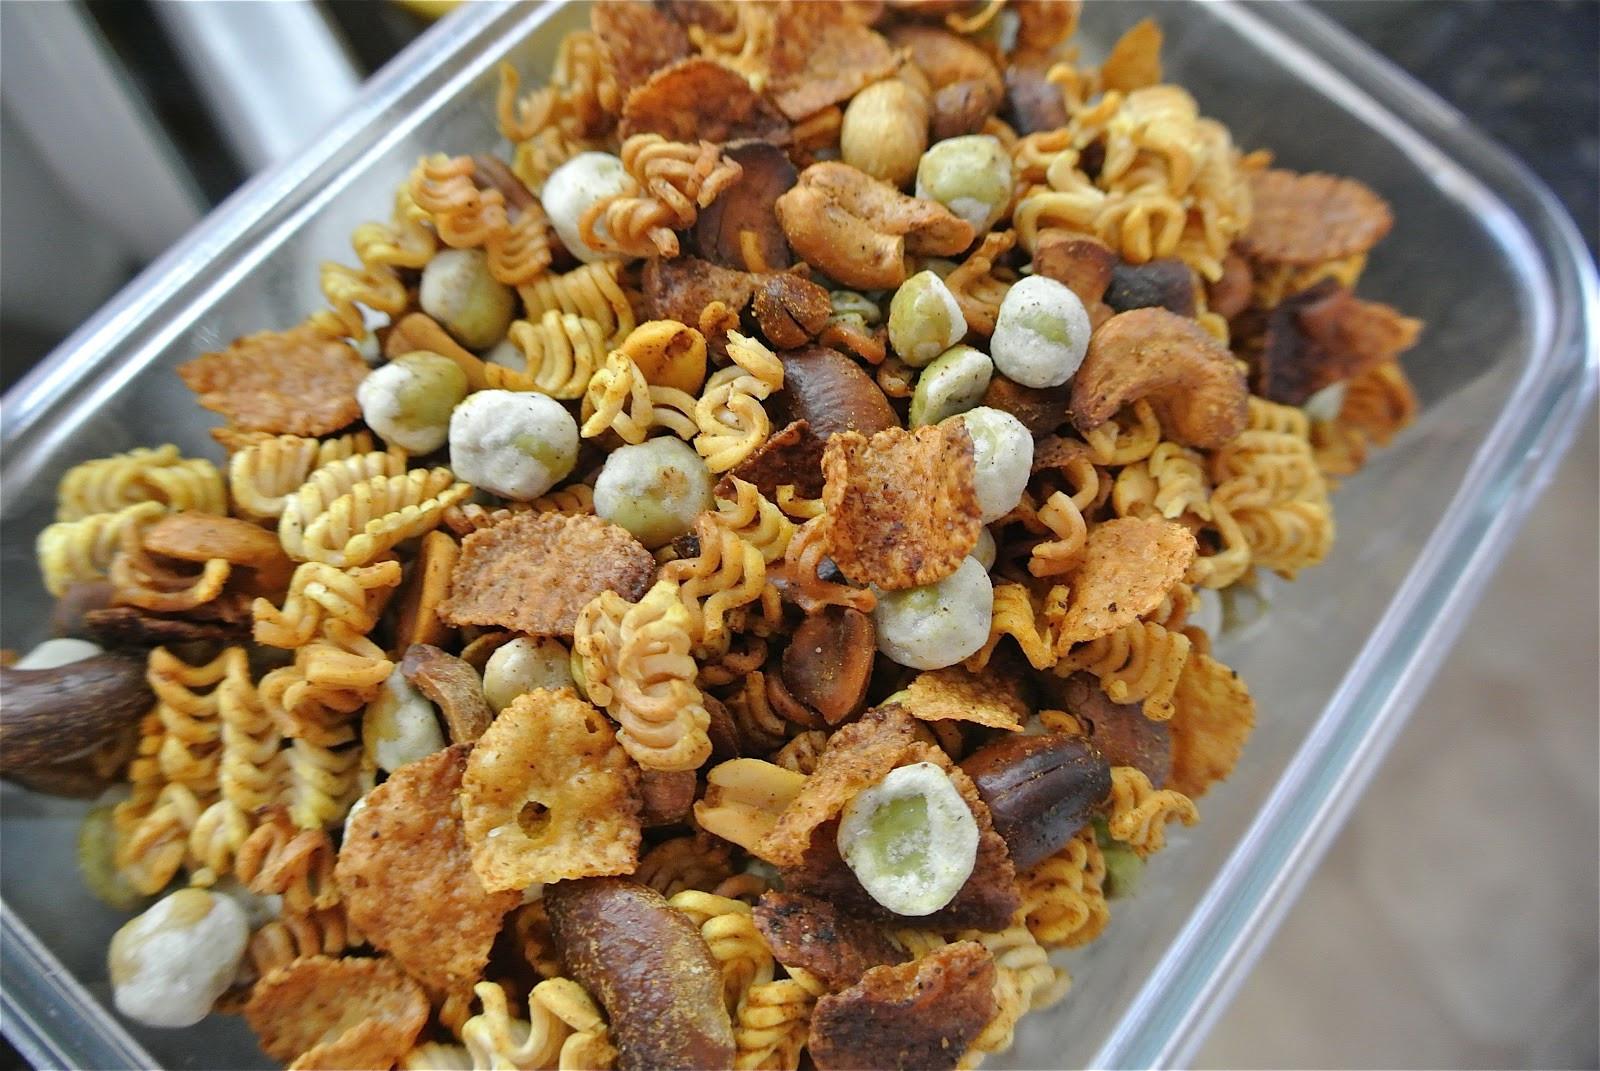 Healthy Crunchy Snacks  Crunchy Ramen Snack Mix Thrifty Thursday